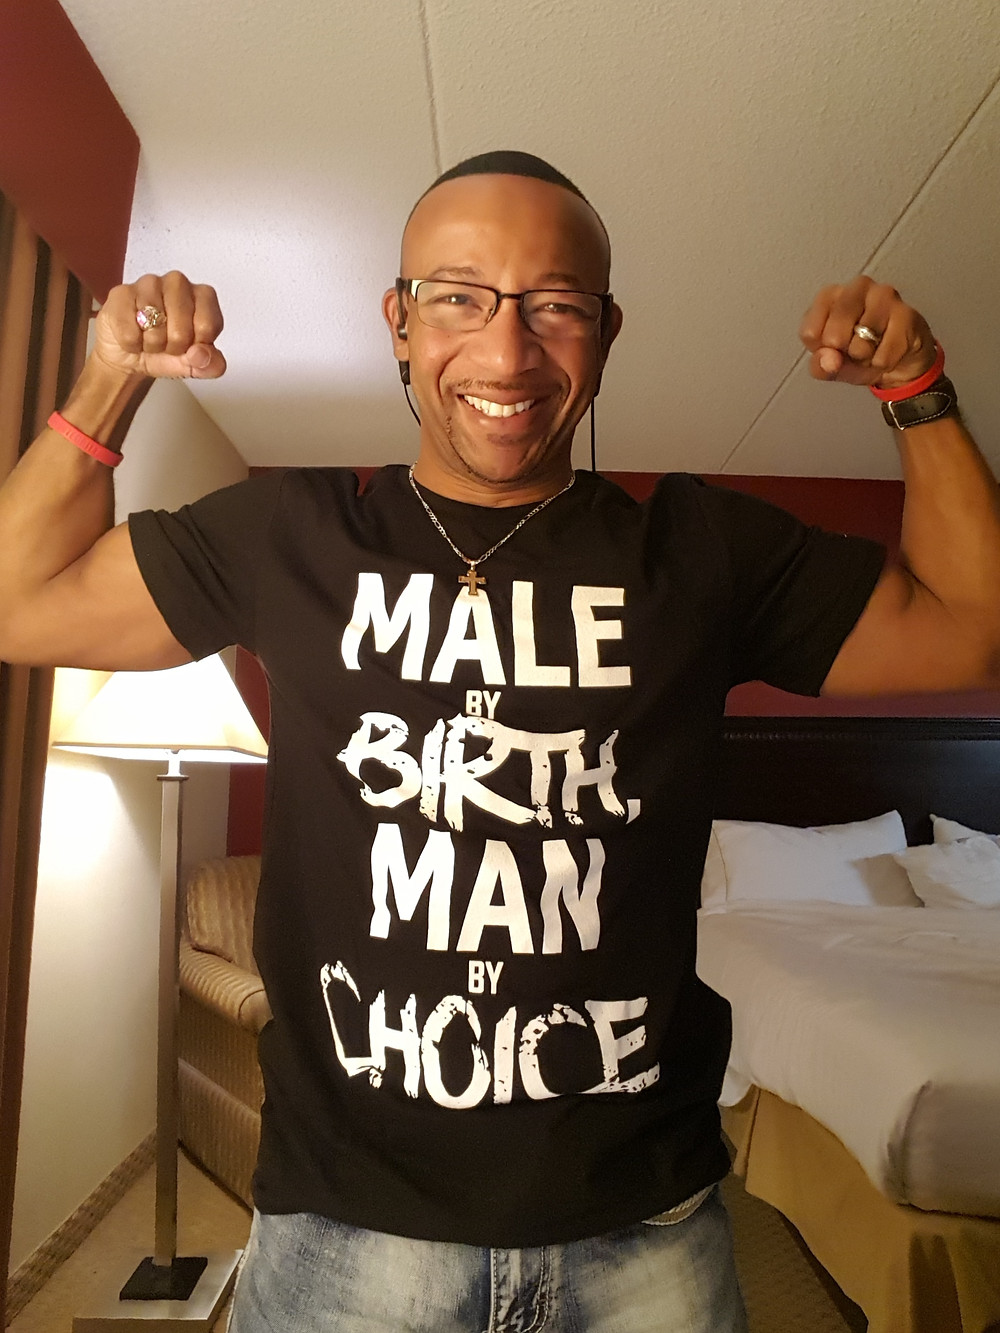 Joe Martin in man by choice t-shirt